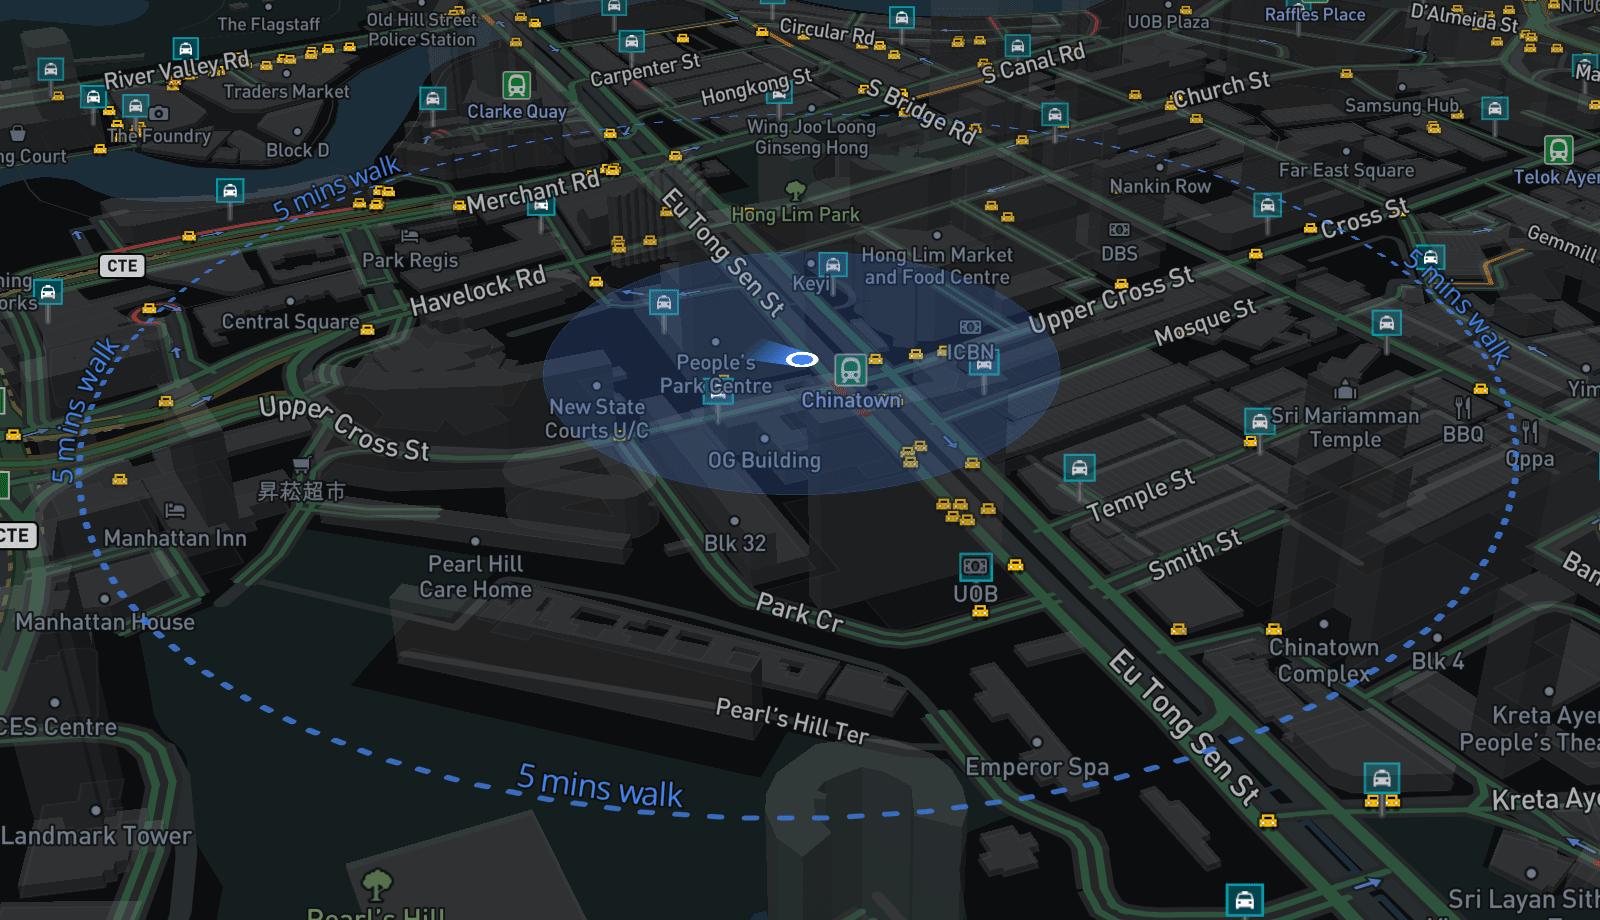 taxirouter-sg-3d-buildings@2x